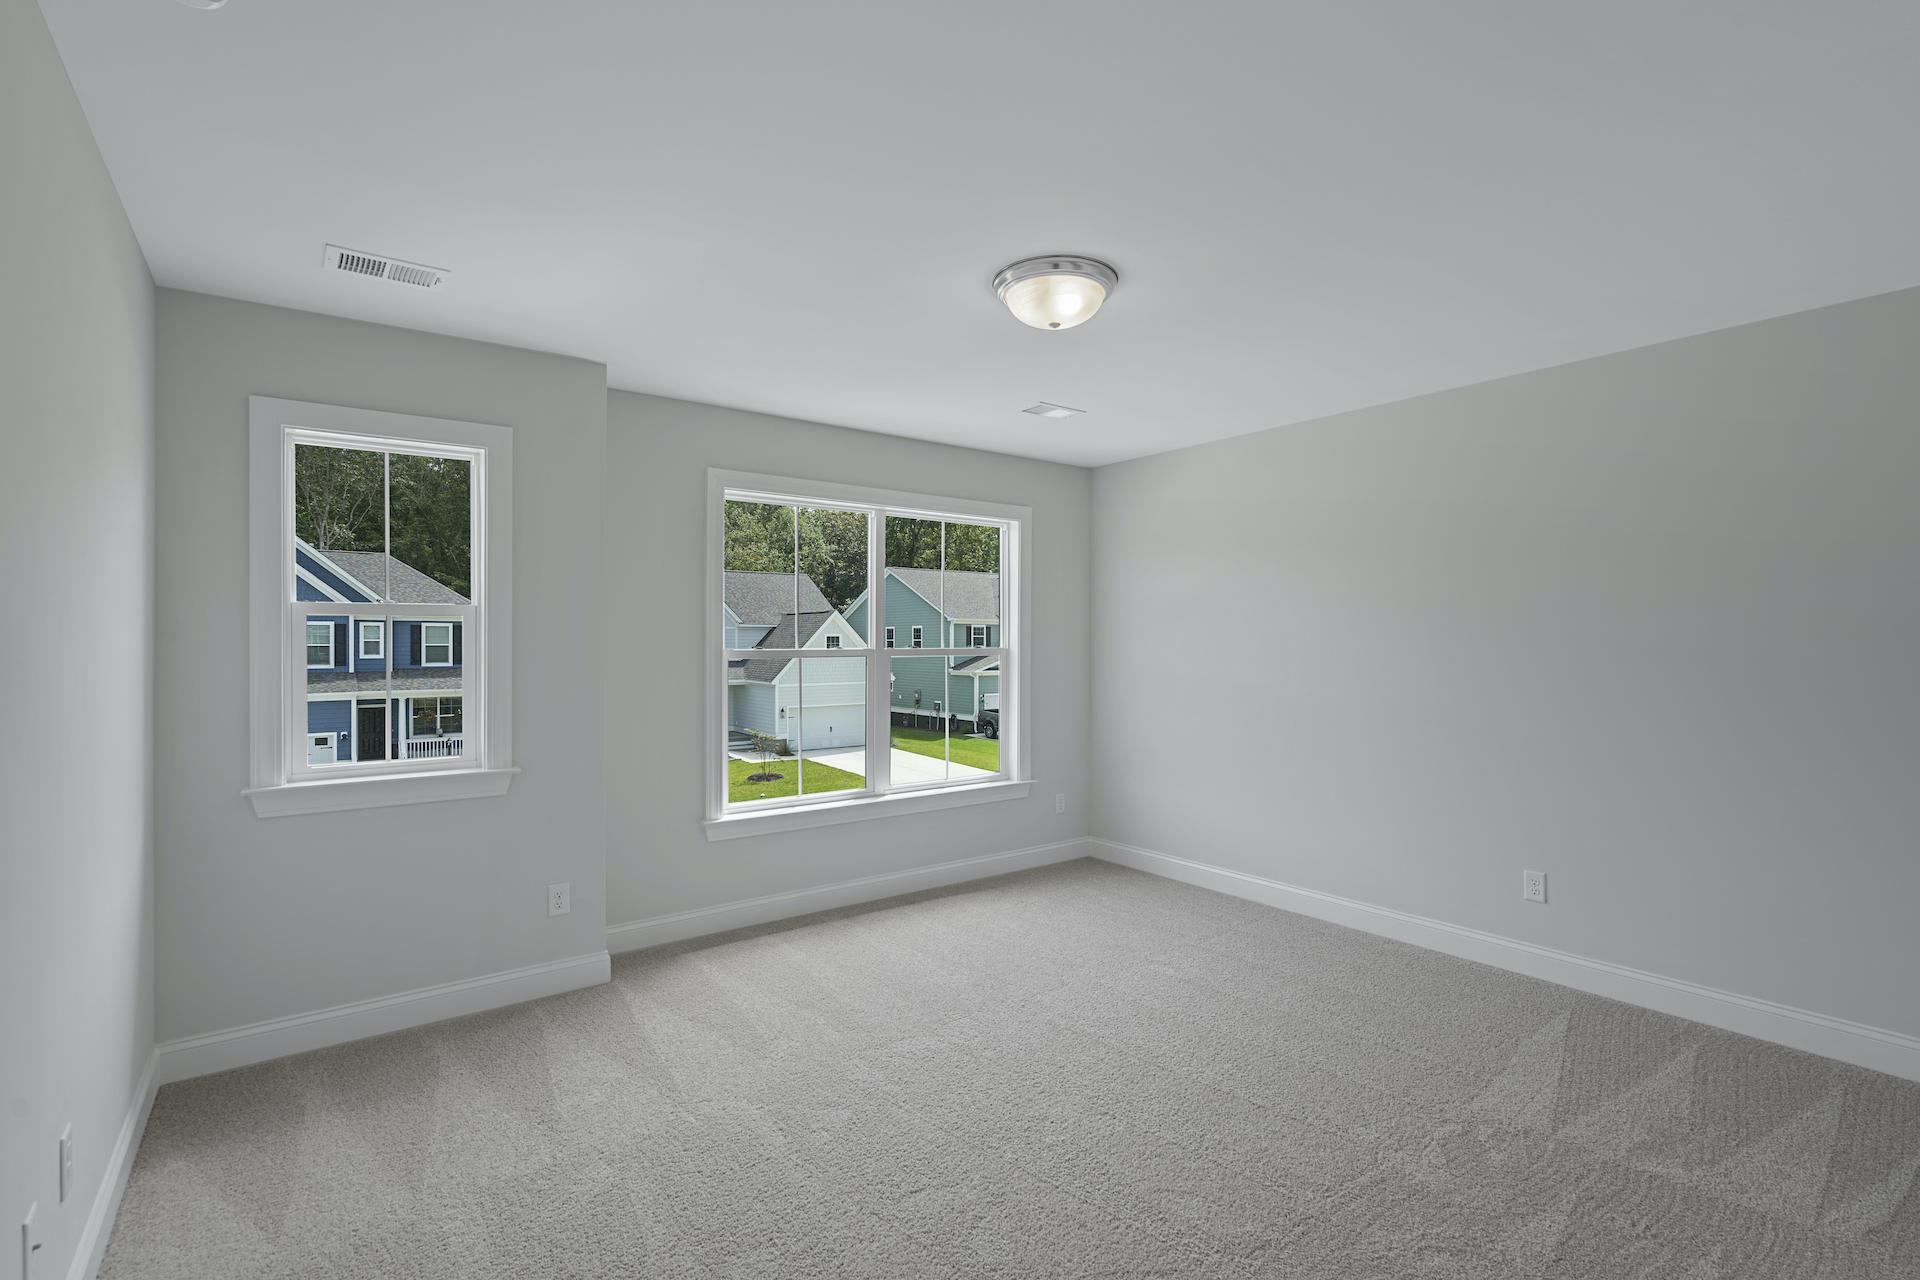 Drayton Oaks Homes For Sale - 105 Plowden Mill, Summerville, SC - 5